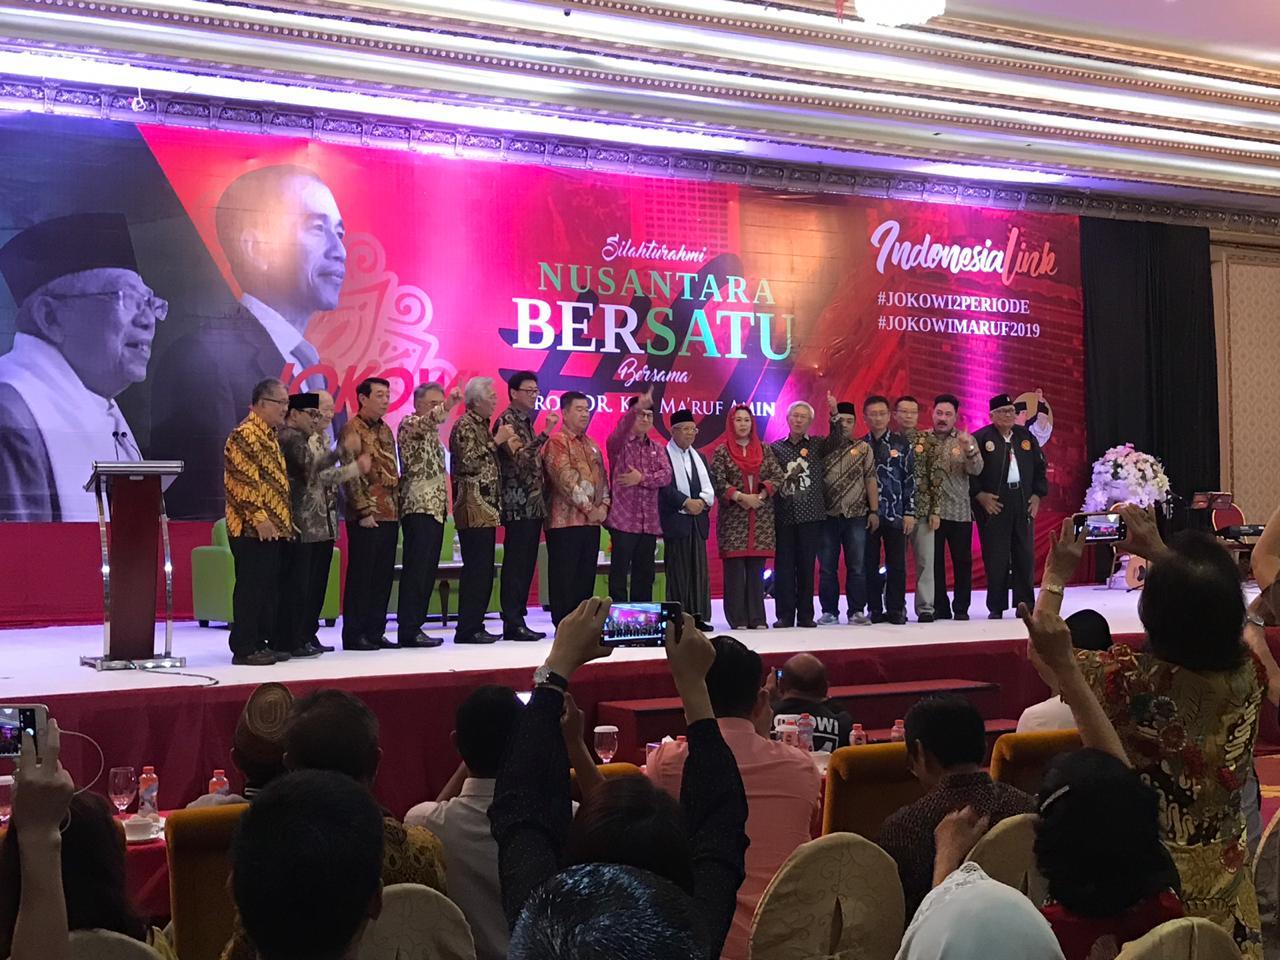 Hindari Konflik, Kiai Ma'ruf Minta Rakyat Indonesia Hidup Rukun